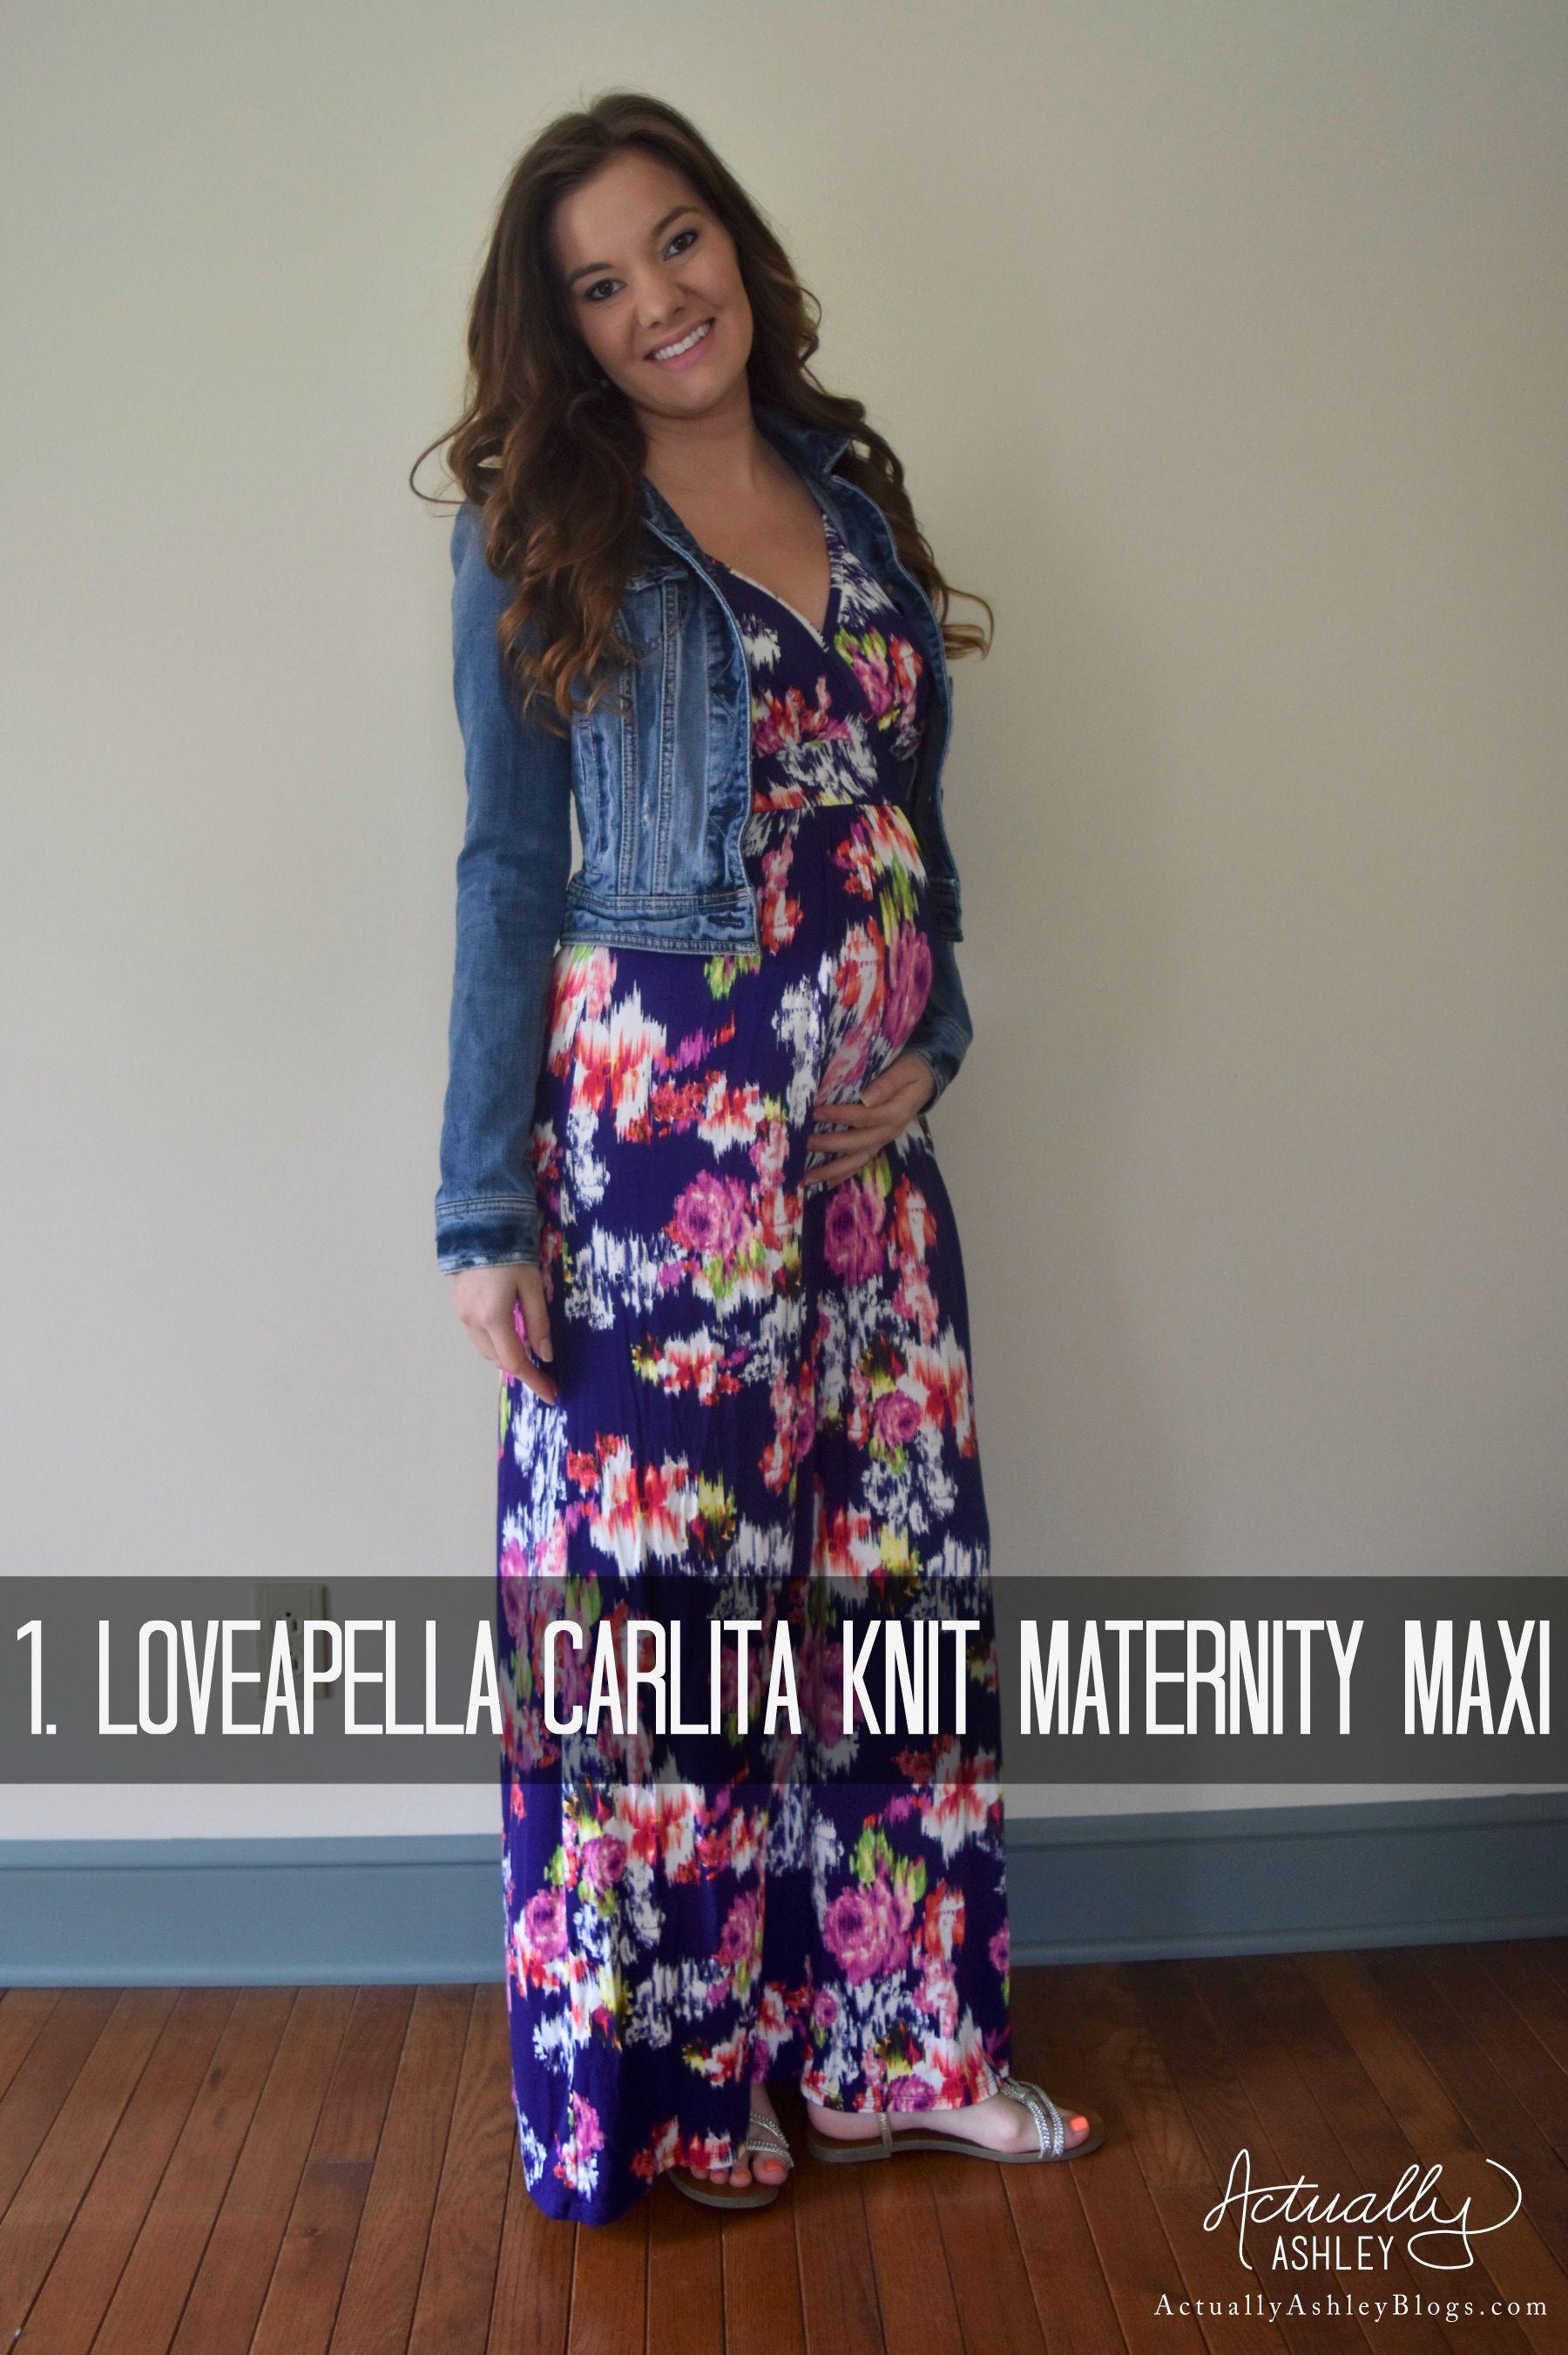 827e03f05 Stitch Fix Lovapella Carlita Knit Maternity Maxi Dress- Purple floral with  jean jacket Getting My Fix- Stitch Fix Review 11 - Actually Ashley